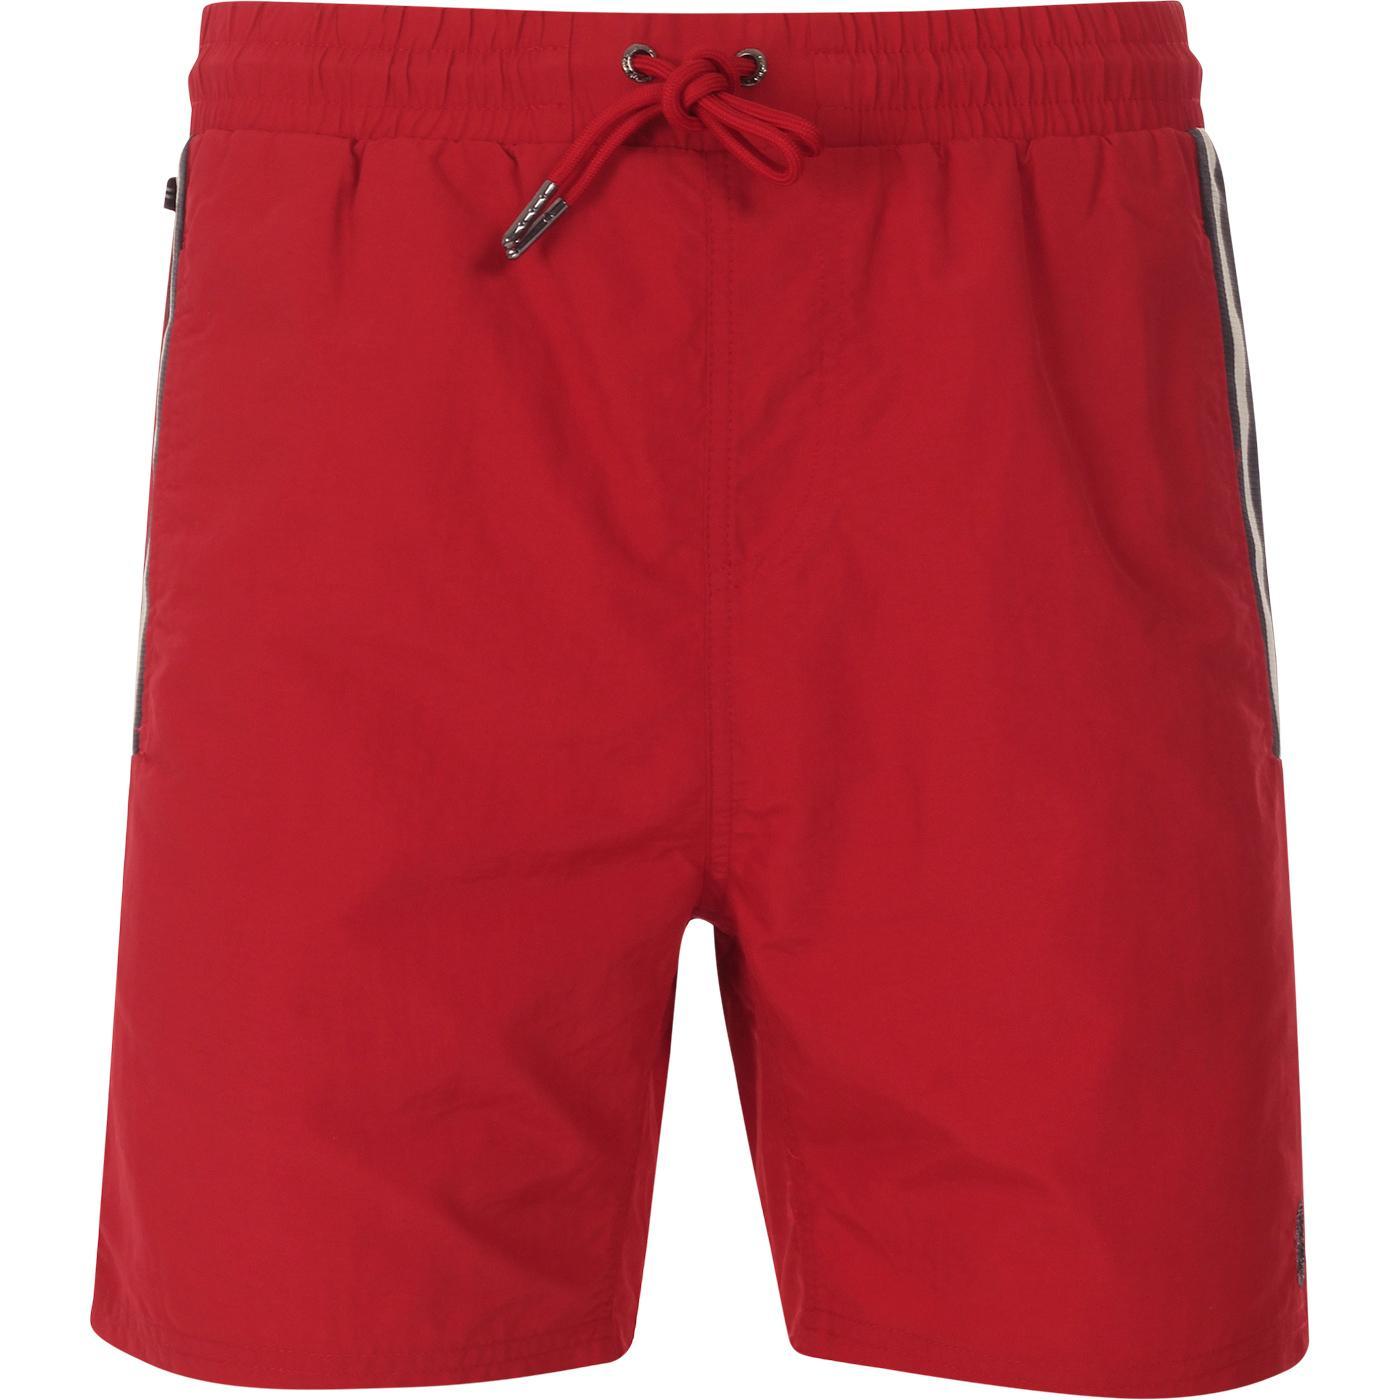 Caen LUKE Retro Mod Piping Swim Shorts Red